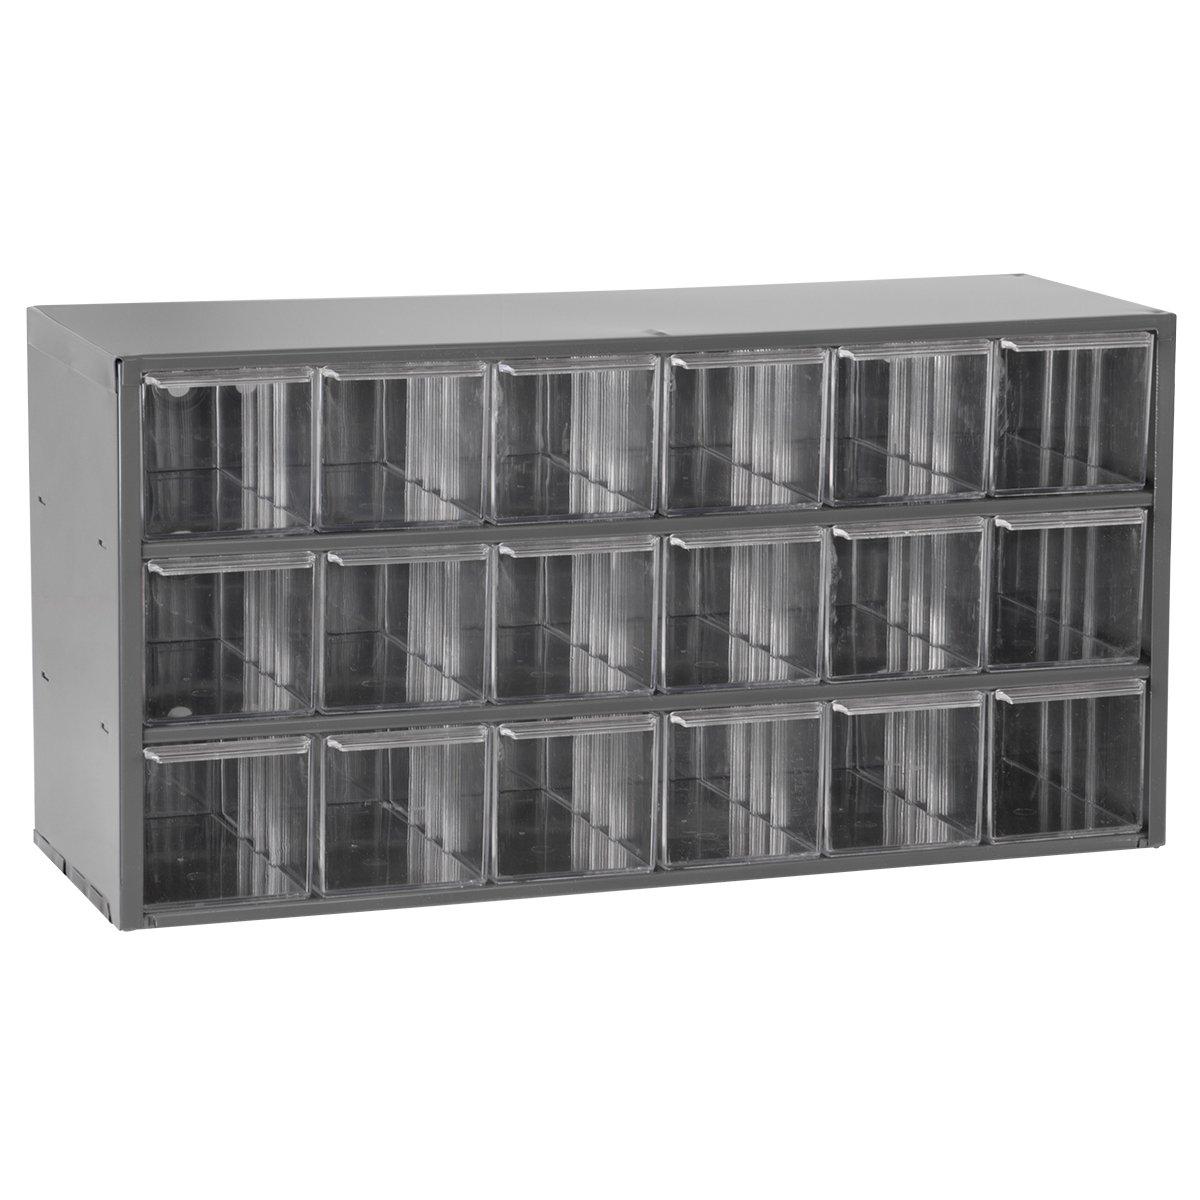 Akro-Mils 17018 18 Drawer Steel Parts Storage Hardware and Craft Cabinet, Grey